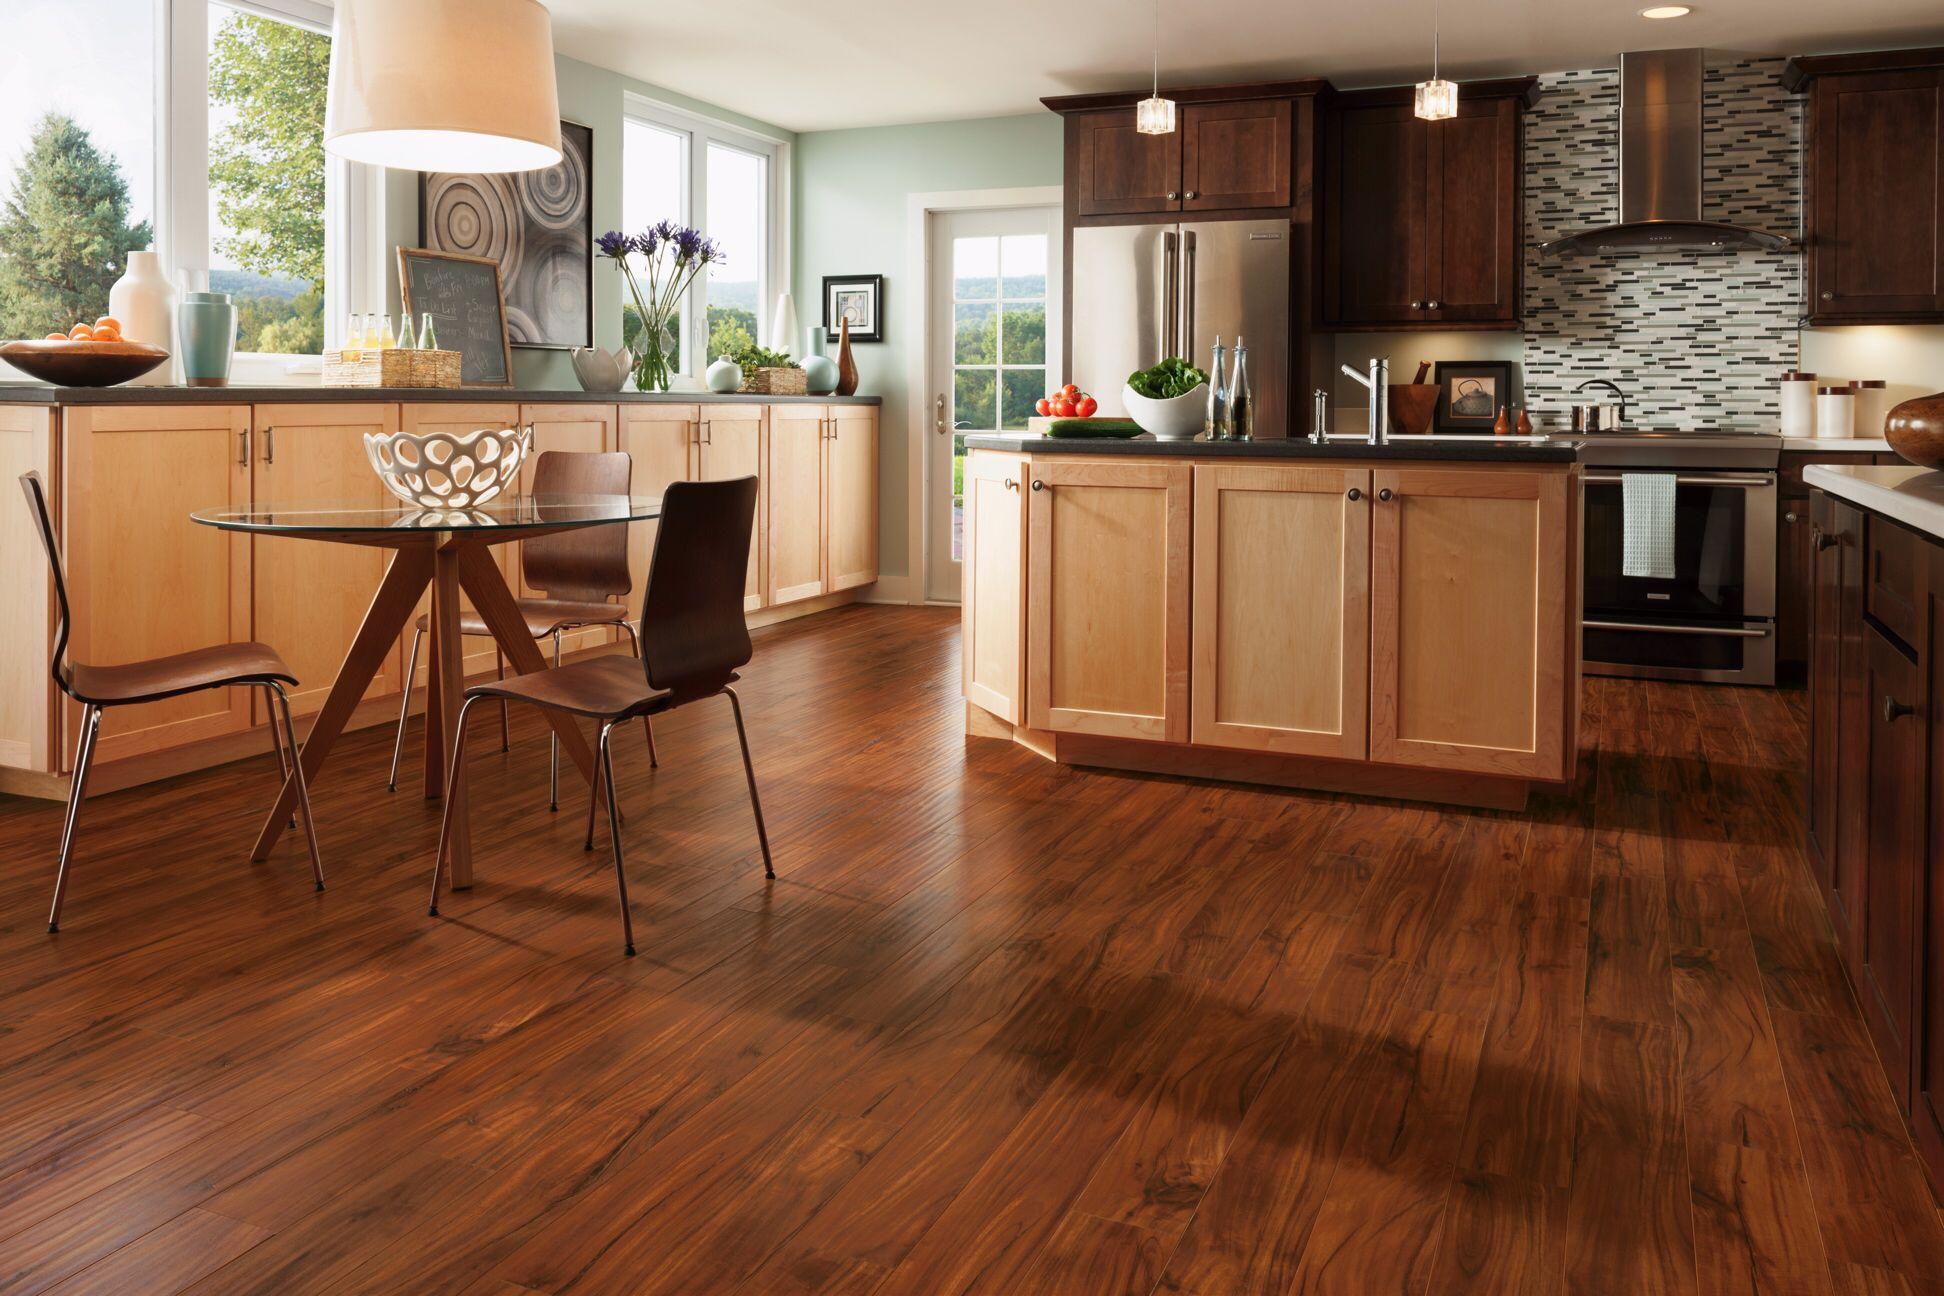 Superb Flooring & Design 248-541-6666 | Armstrong | Pinterest